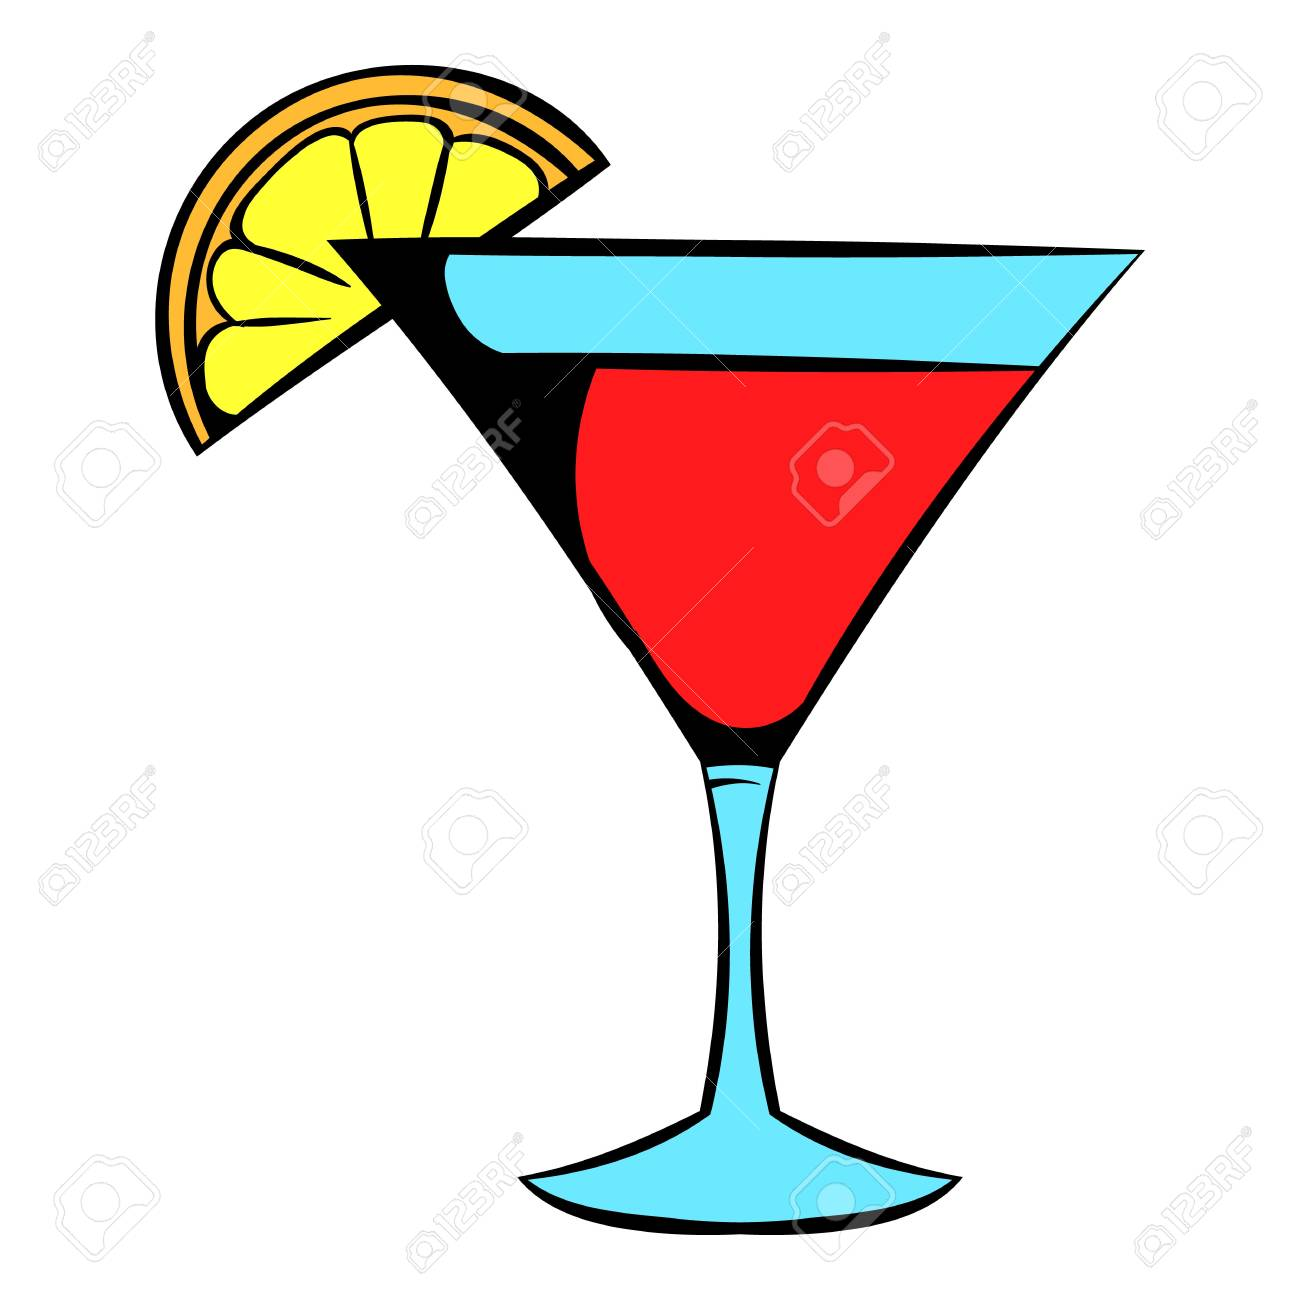 martini glass with red cocktail icon icon cartoon royalty free rh 123rf com cartoon pics of martini glasses cartoon martini glass clipart